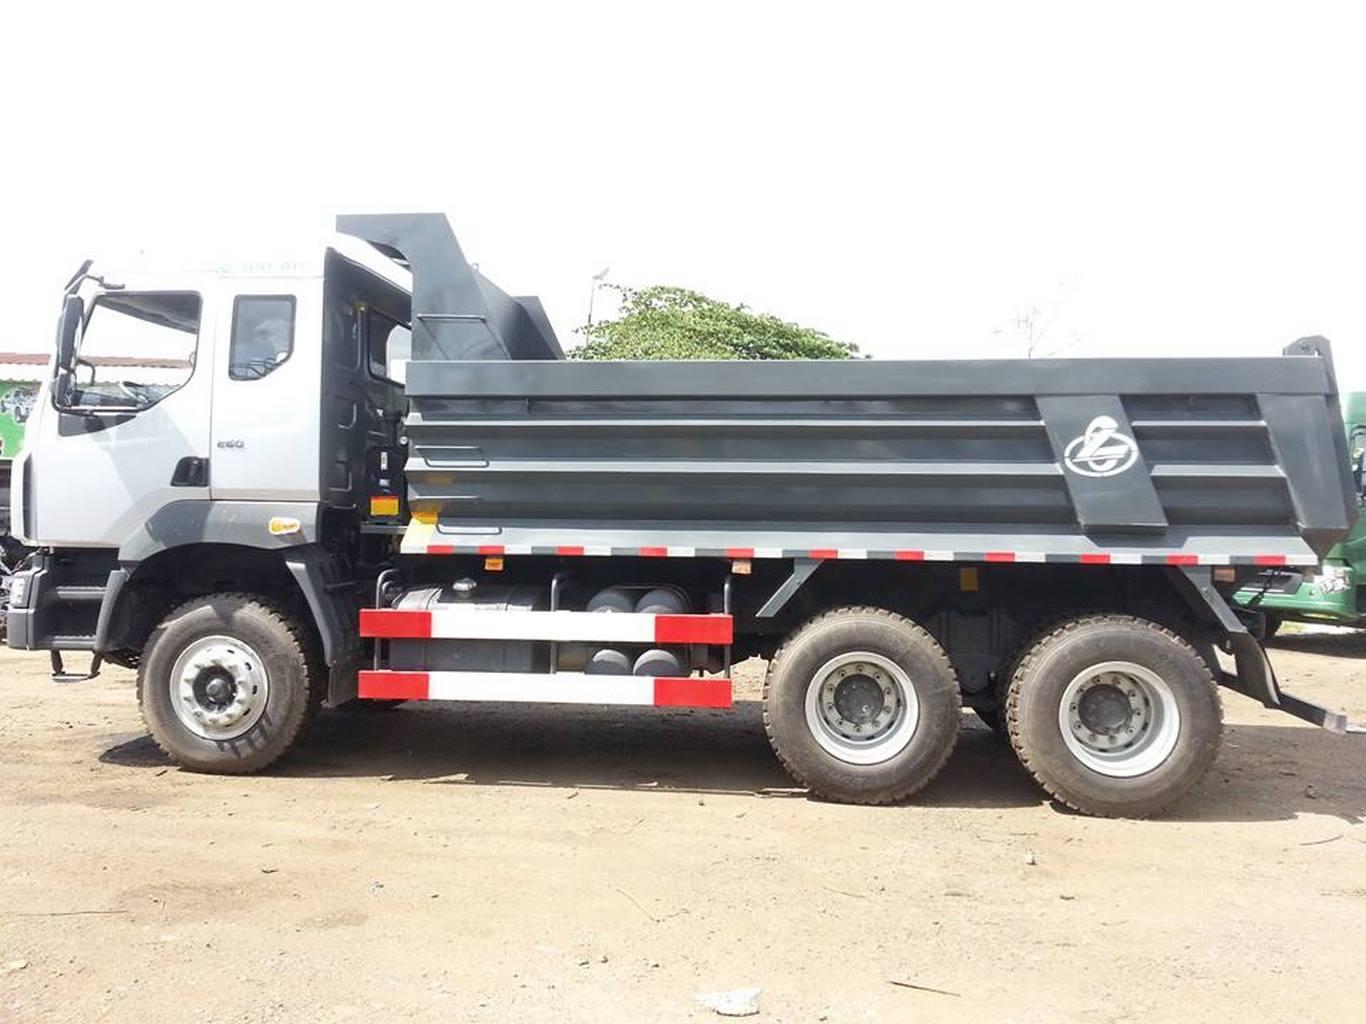 Cần bán xe ben chenglong 3 chân - Bán xe tải tự đổ chenglong 3 chân - xe ben chenglong